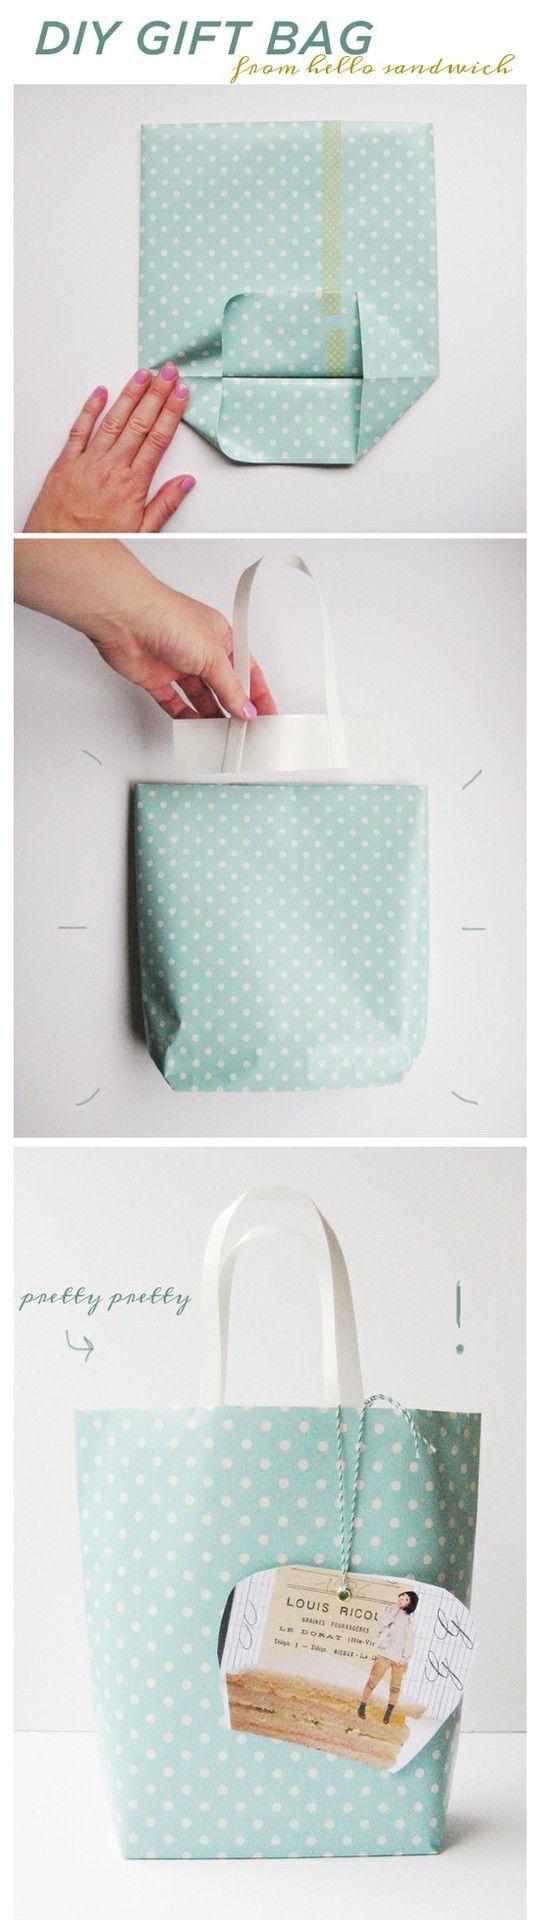 DIY Gift Bag (x).   Use fabric scraps and sew bottom.